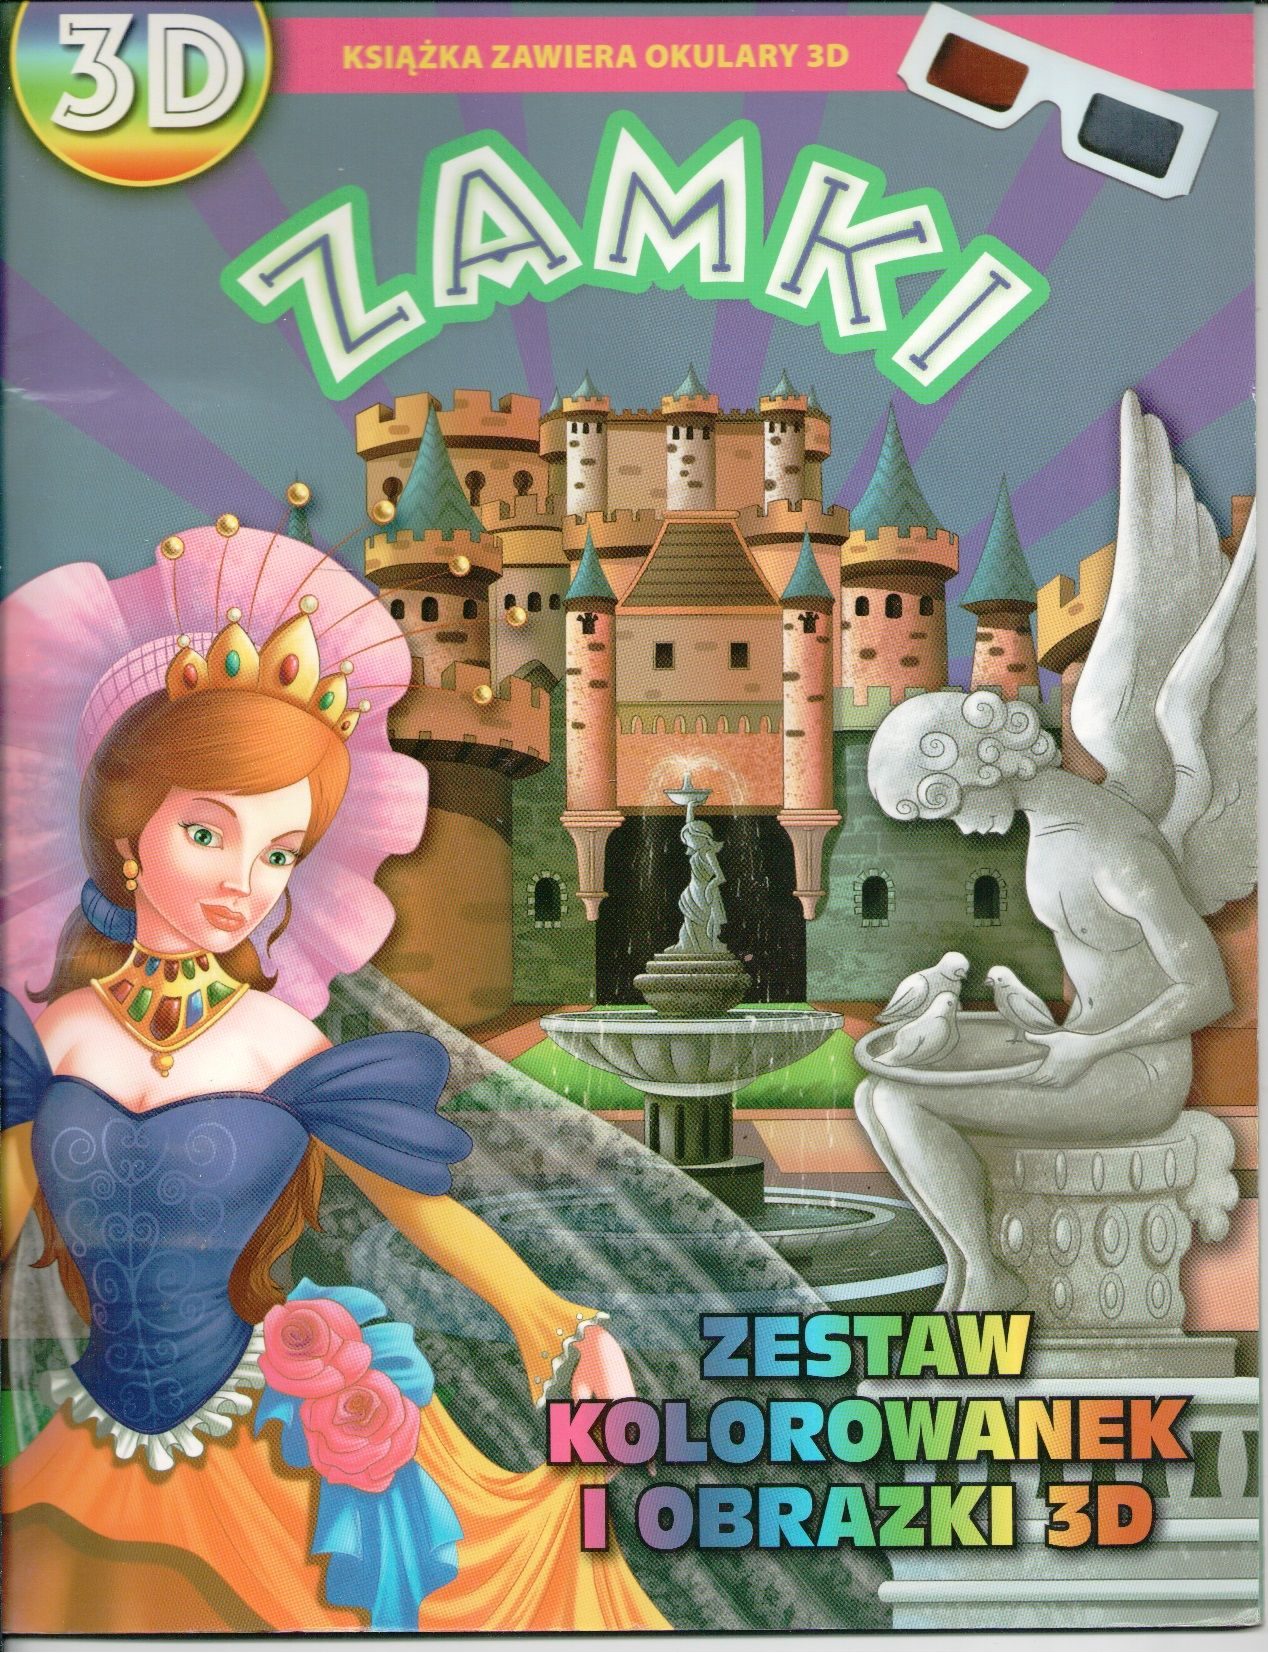 Zamki Zestaw Kolorowanek I Obrazki 3d Wydawnictwo Wilga Mario Characters Character Fictional Characters